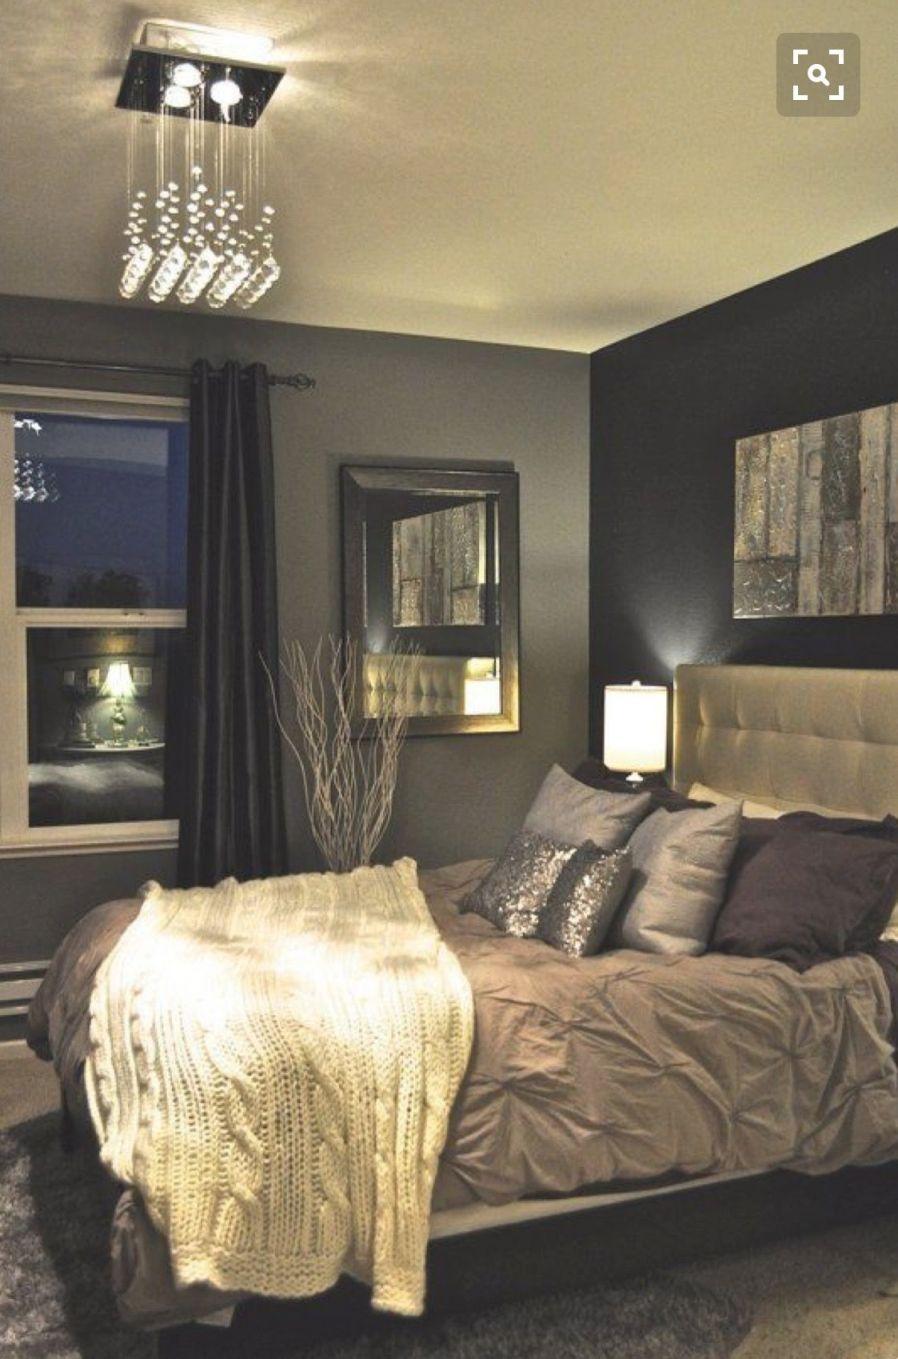 Pinterest • Xosarahxbethxo | Remodel Bedroom, Master within Romantic Bedroom Decorating Ideas Pinterest